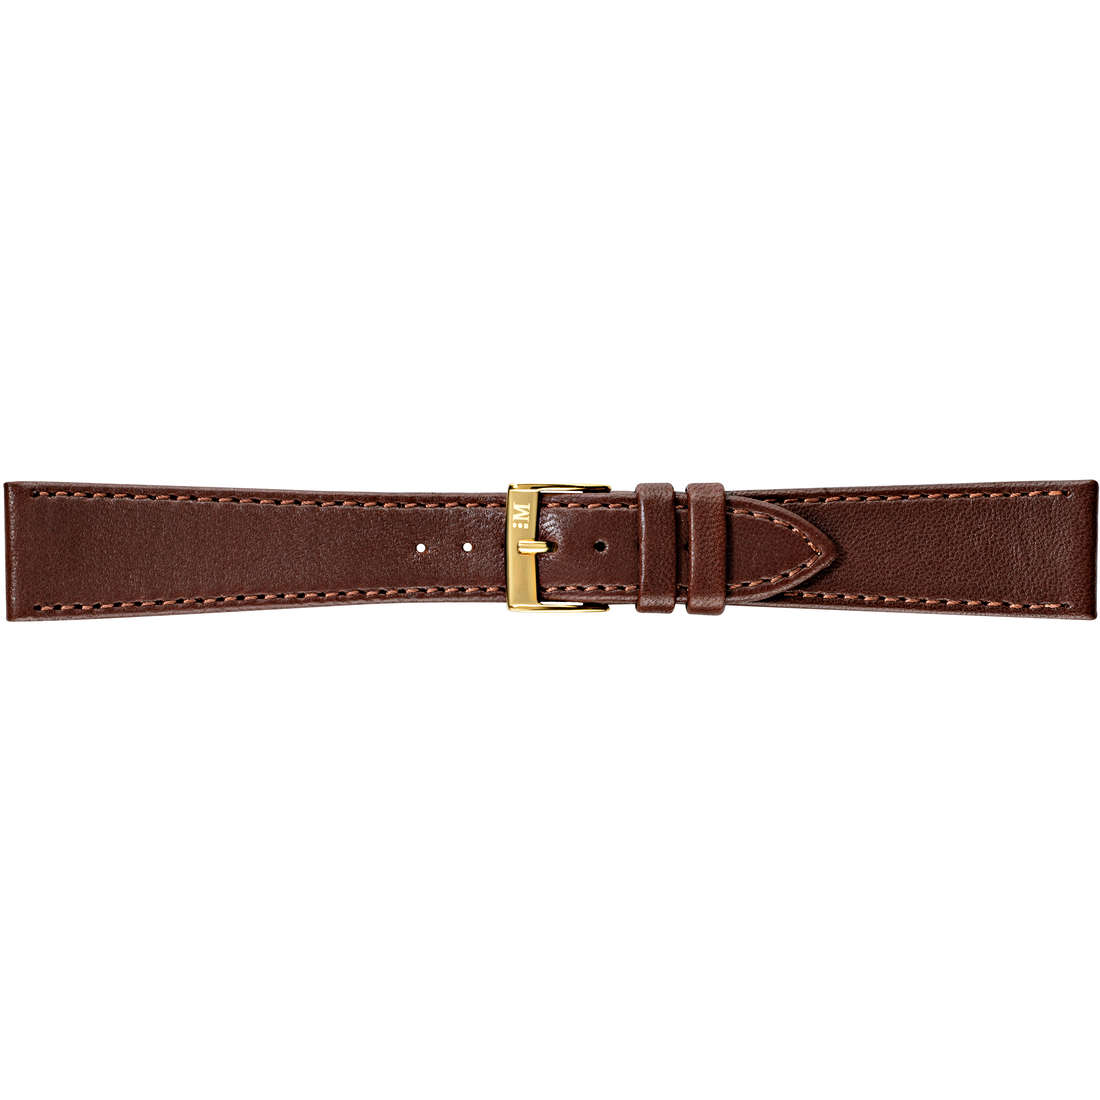 watch watch bands watch straps man Morellato Morellato 1930 A01U0770006030DO16